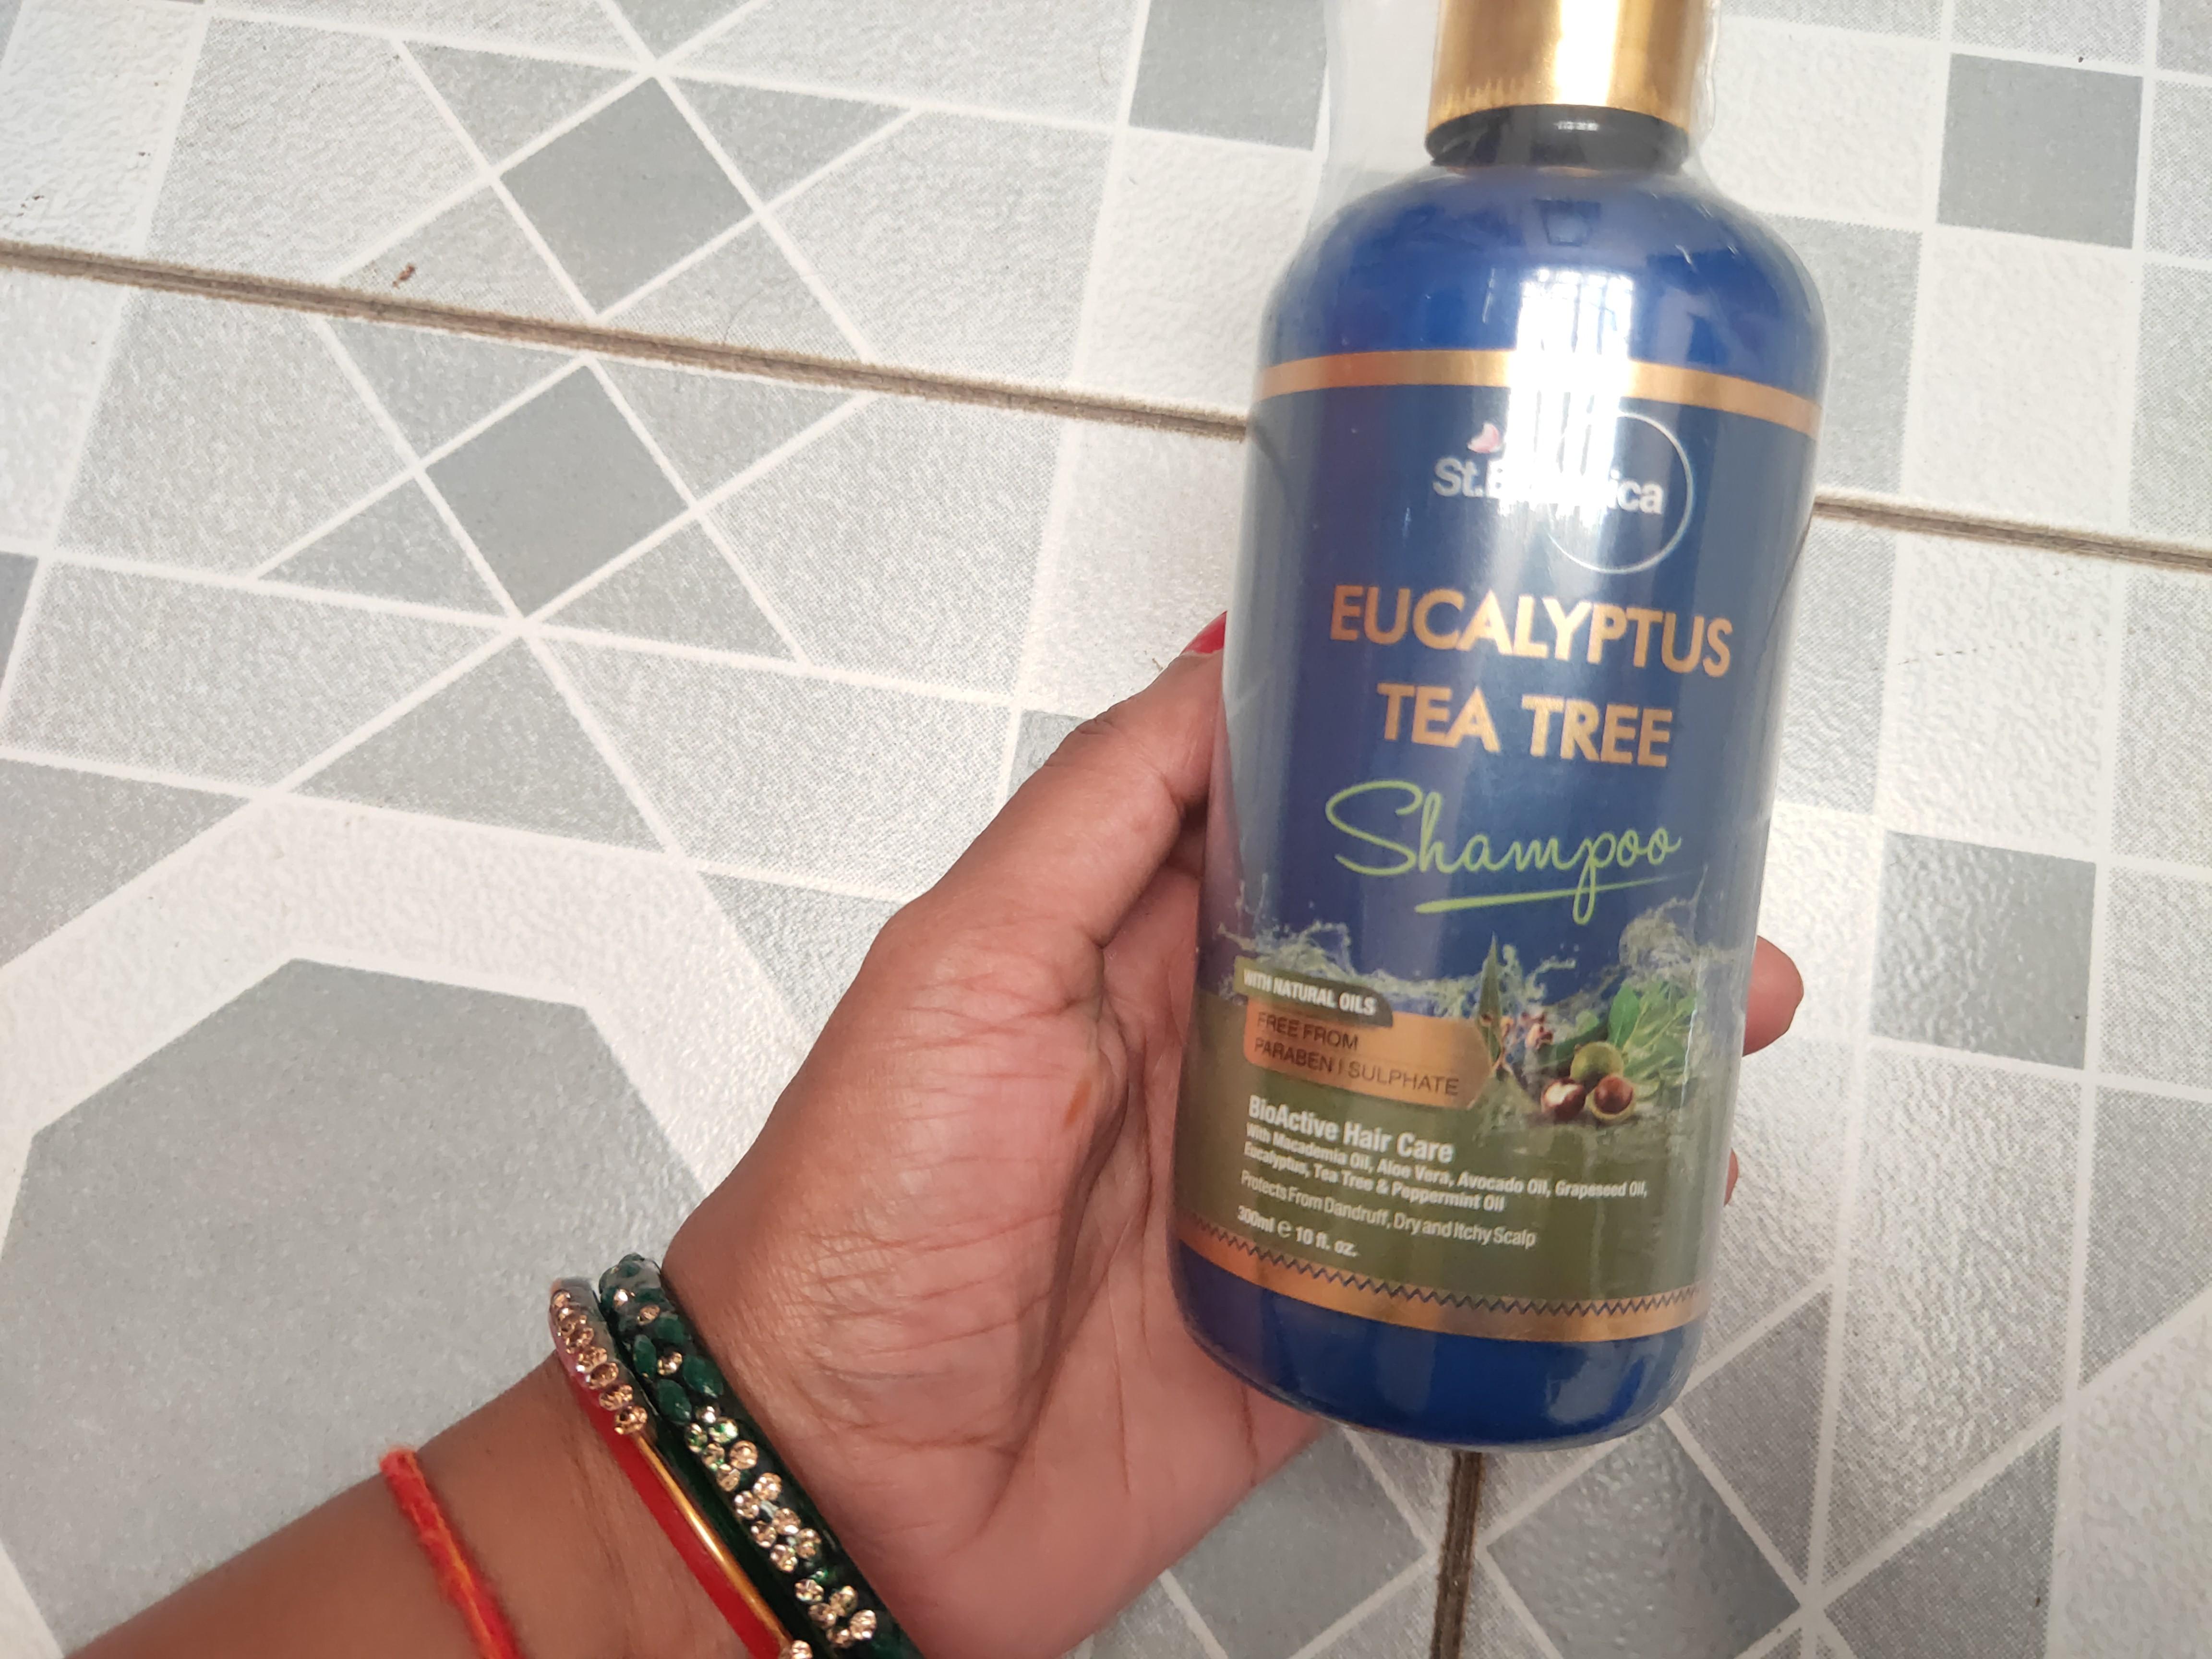 St.Botanica Eucalyptus & Tea Tree Dry Hair Repair Shampoo-Best Shampoo For Clean And Healthy Scalp-By anupama_pandey